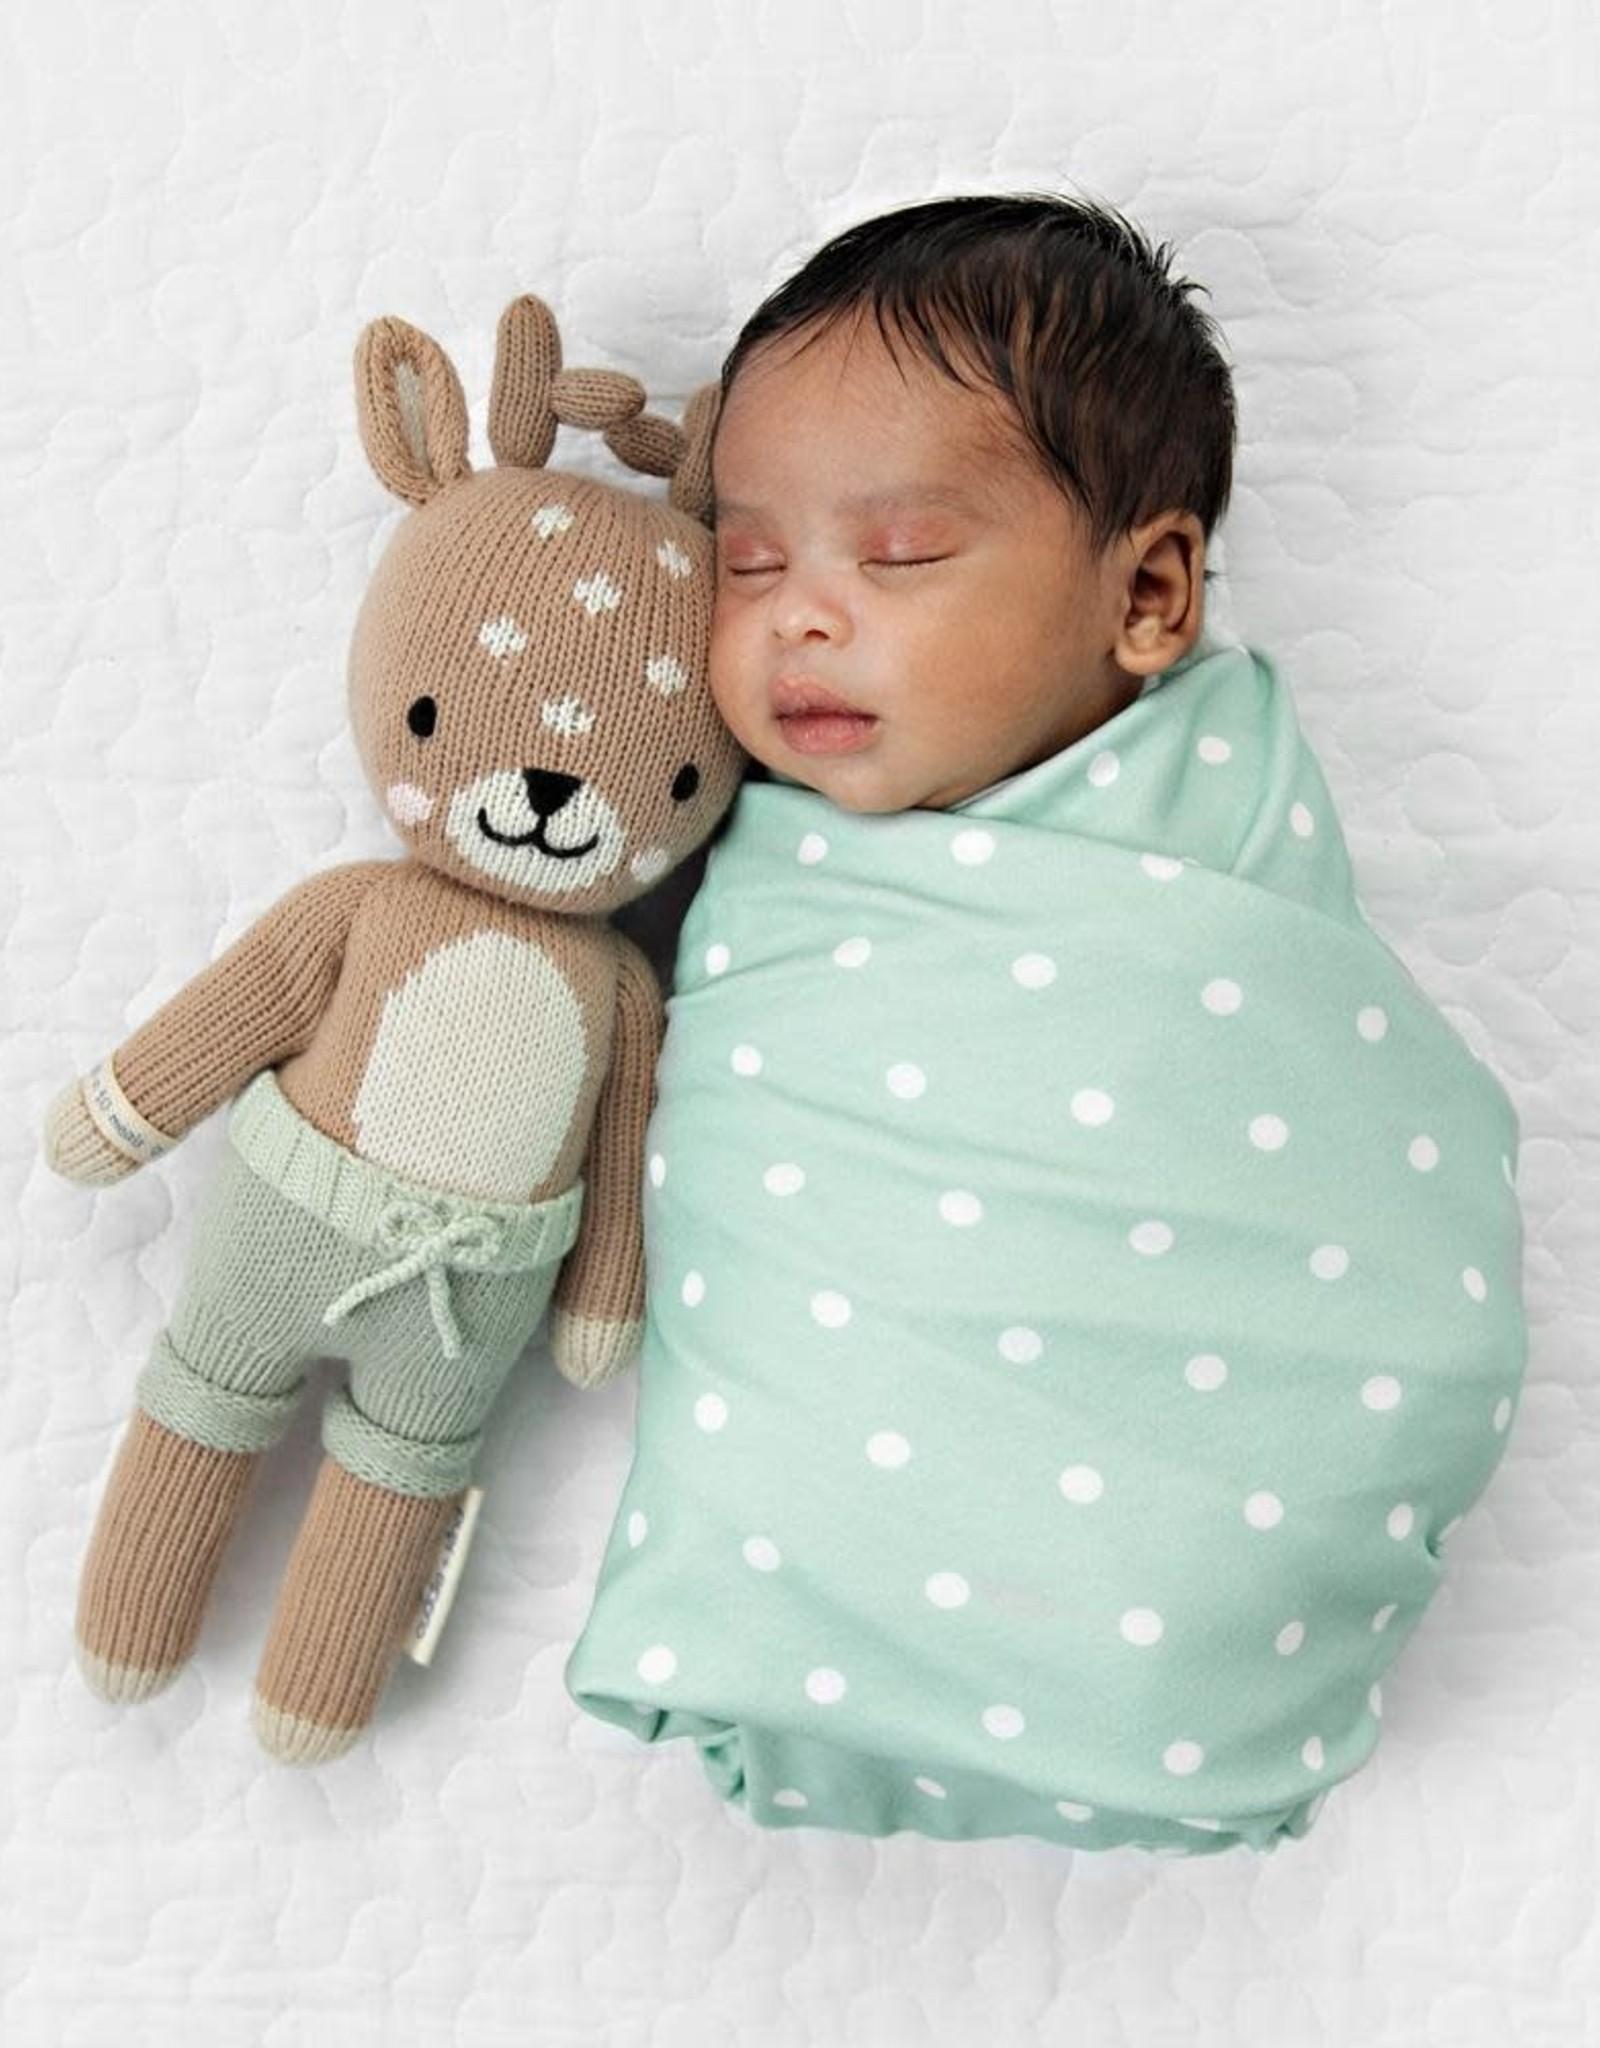 Cuddle+Kind elliott the fawn- little